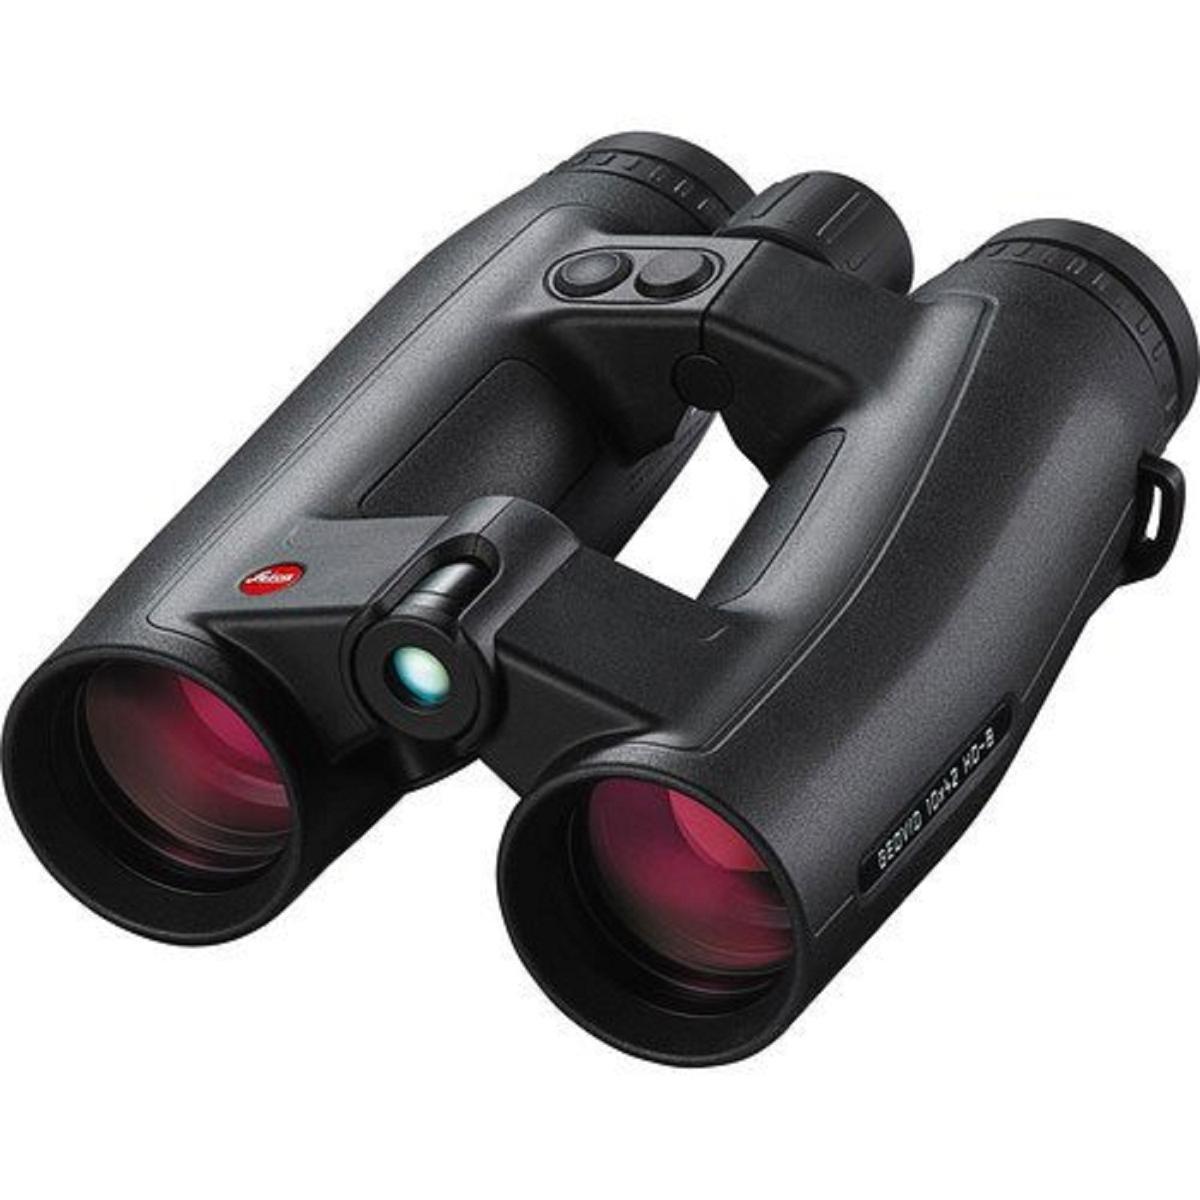 LeicaカメラCo。10 x 42 geovid-r双眼鏡with EHR B01BL2ZBC2